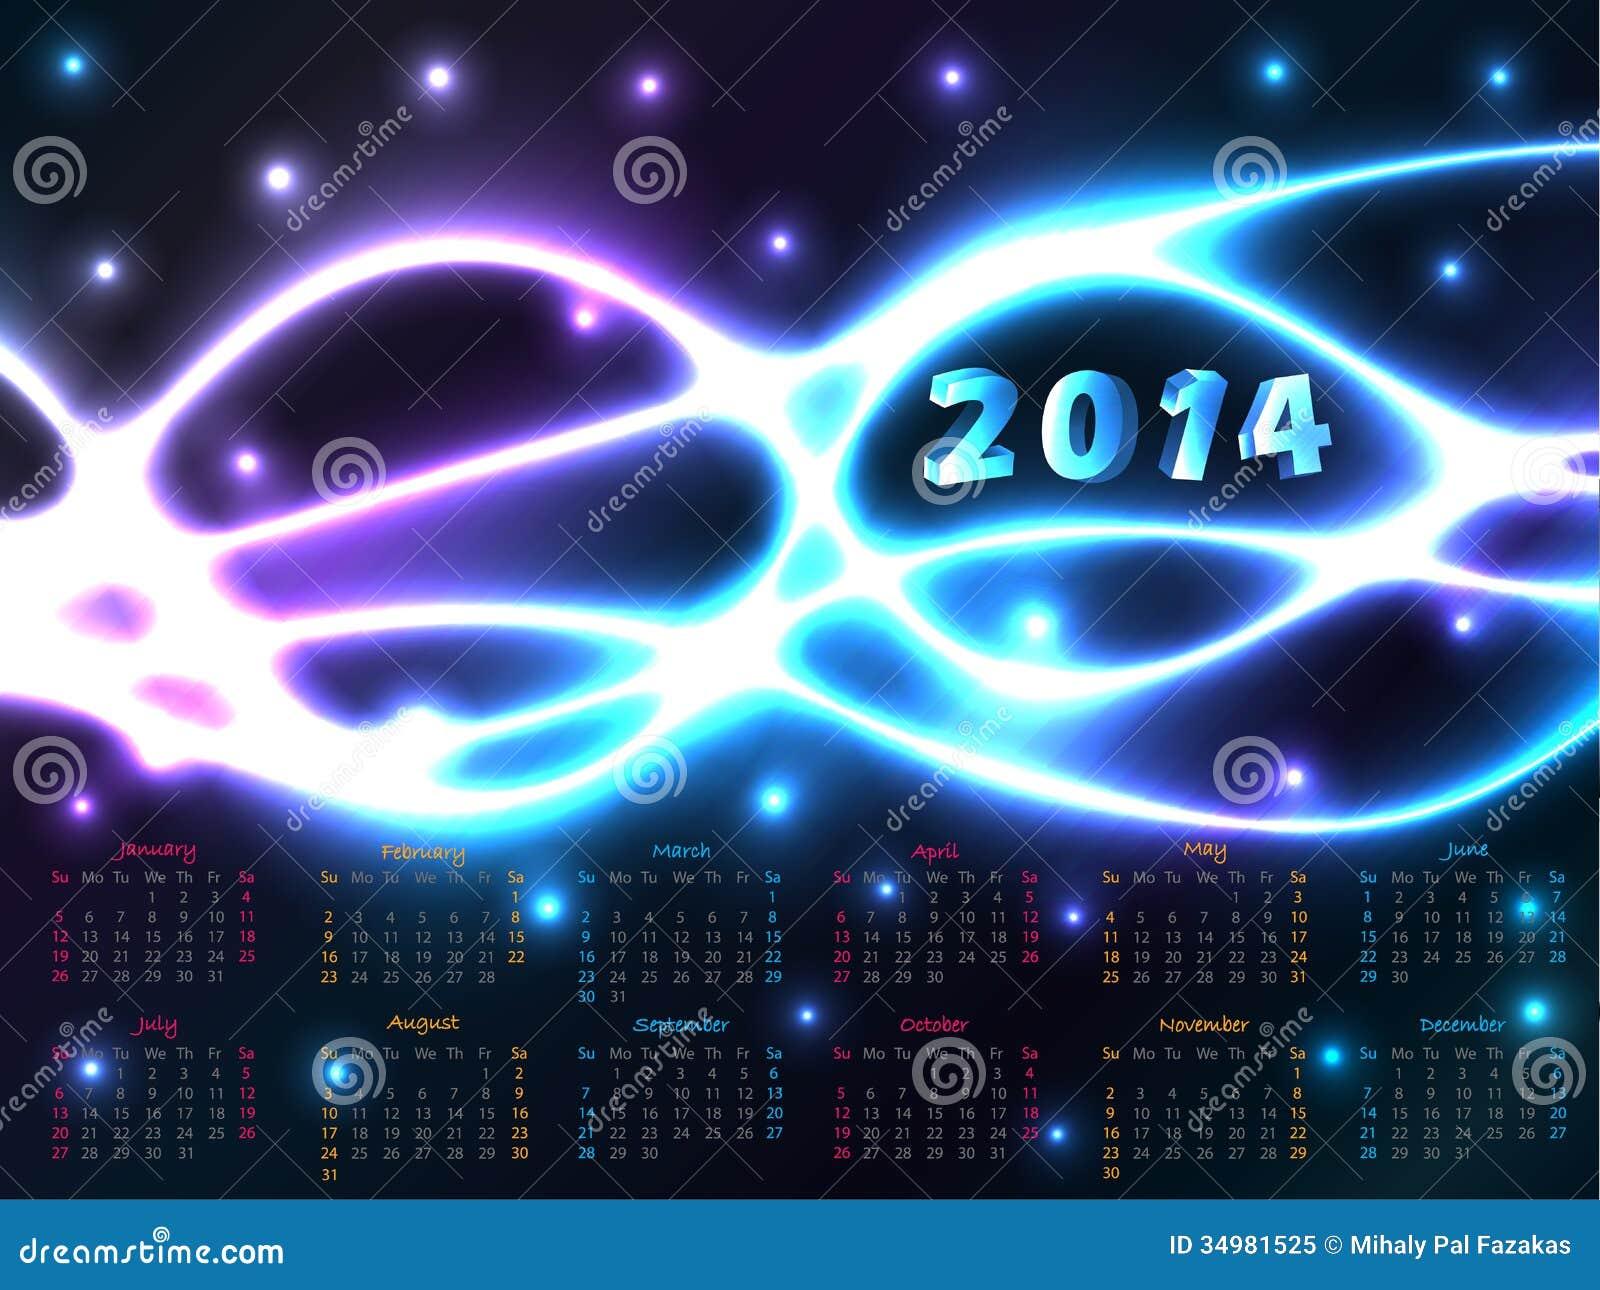 Calendar Background Design : Calendar with plasma background stock vector